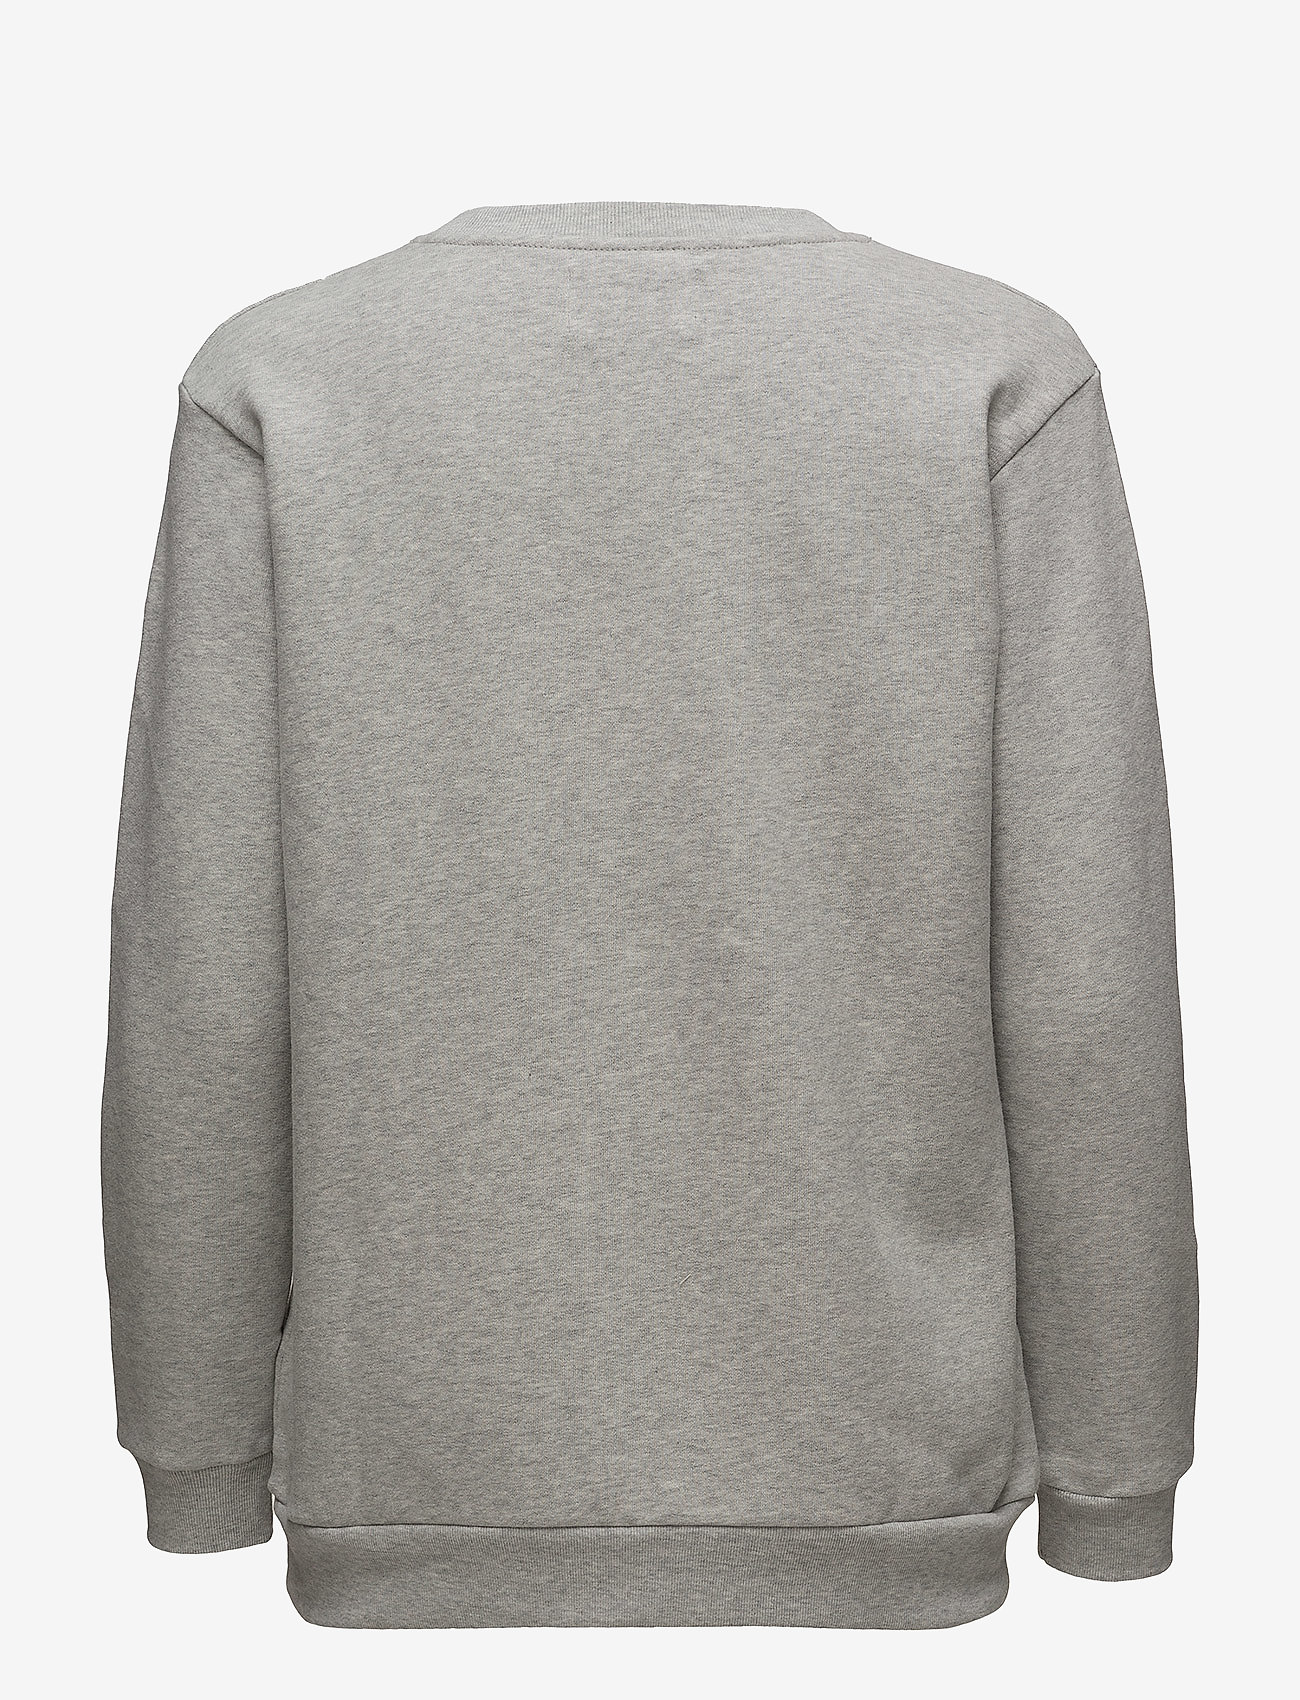 Calvin Klein Jeans - CORE MONOGRAM LOGO SWEATSHIRT - sweatshirts - light grey heather - 1